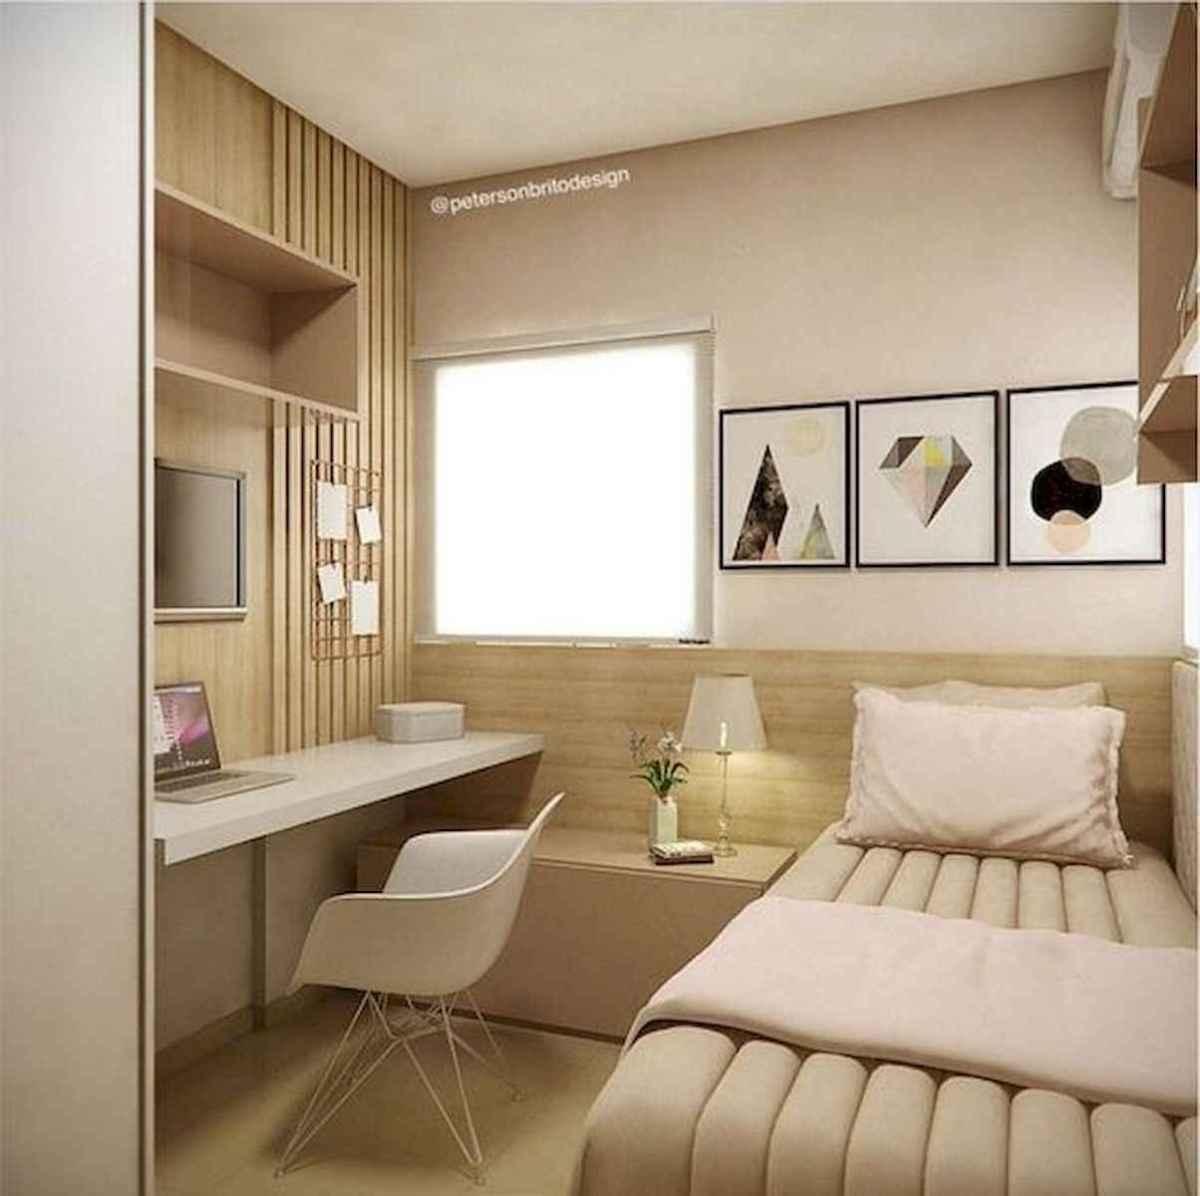 80 Fantastic Small Apartment Bedroom College Design Ideas and Decor (74)